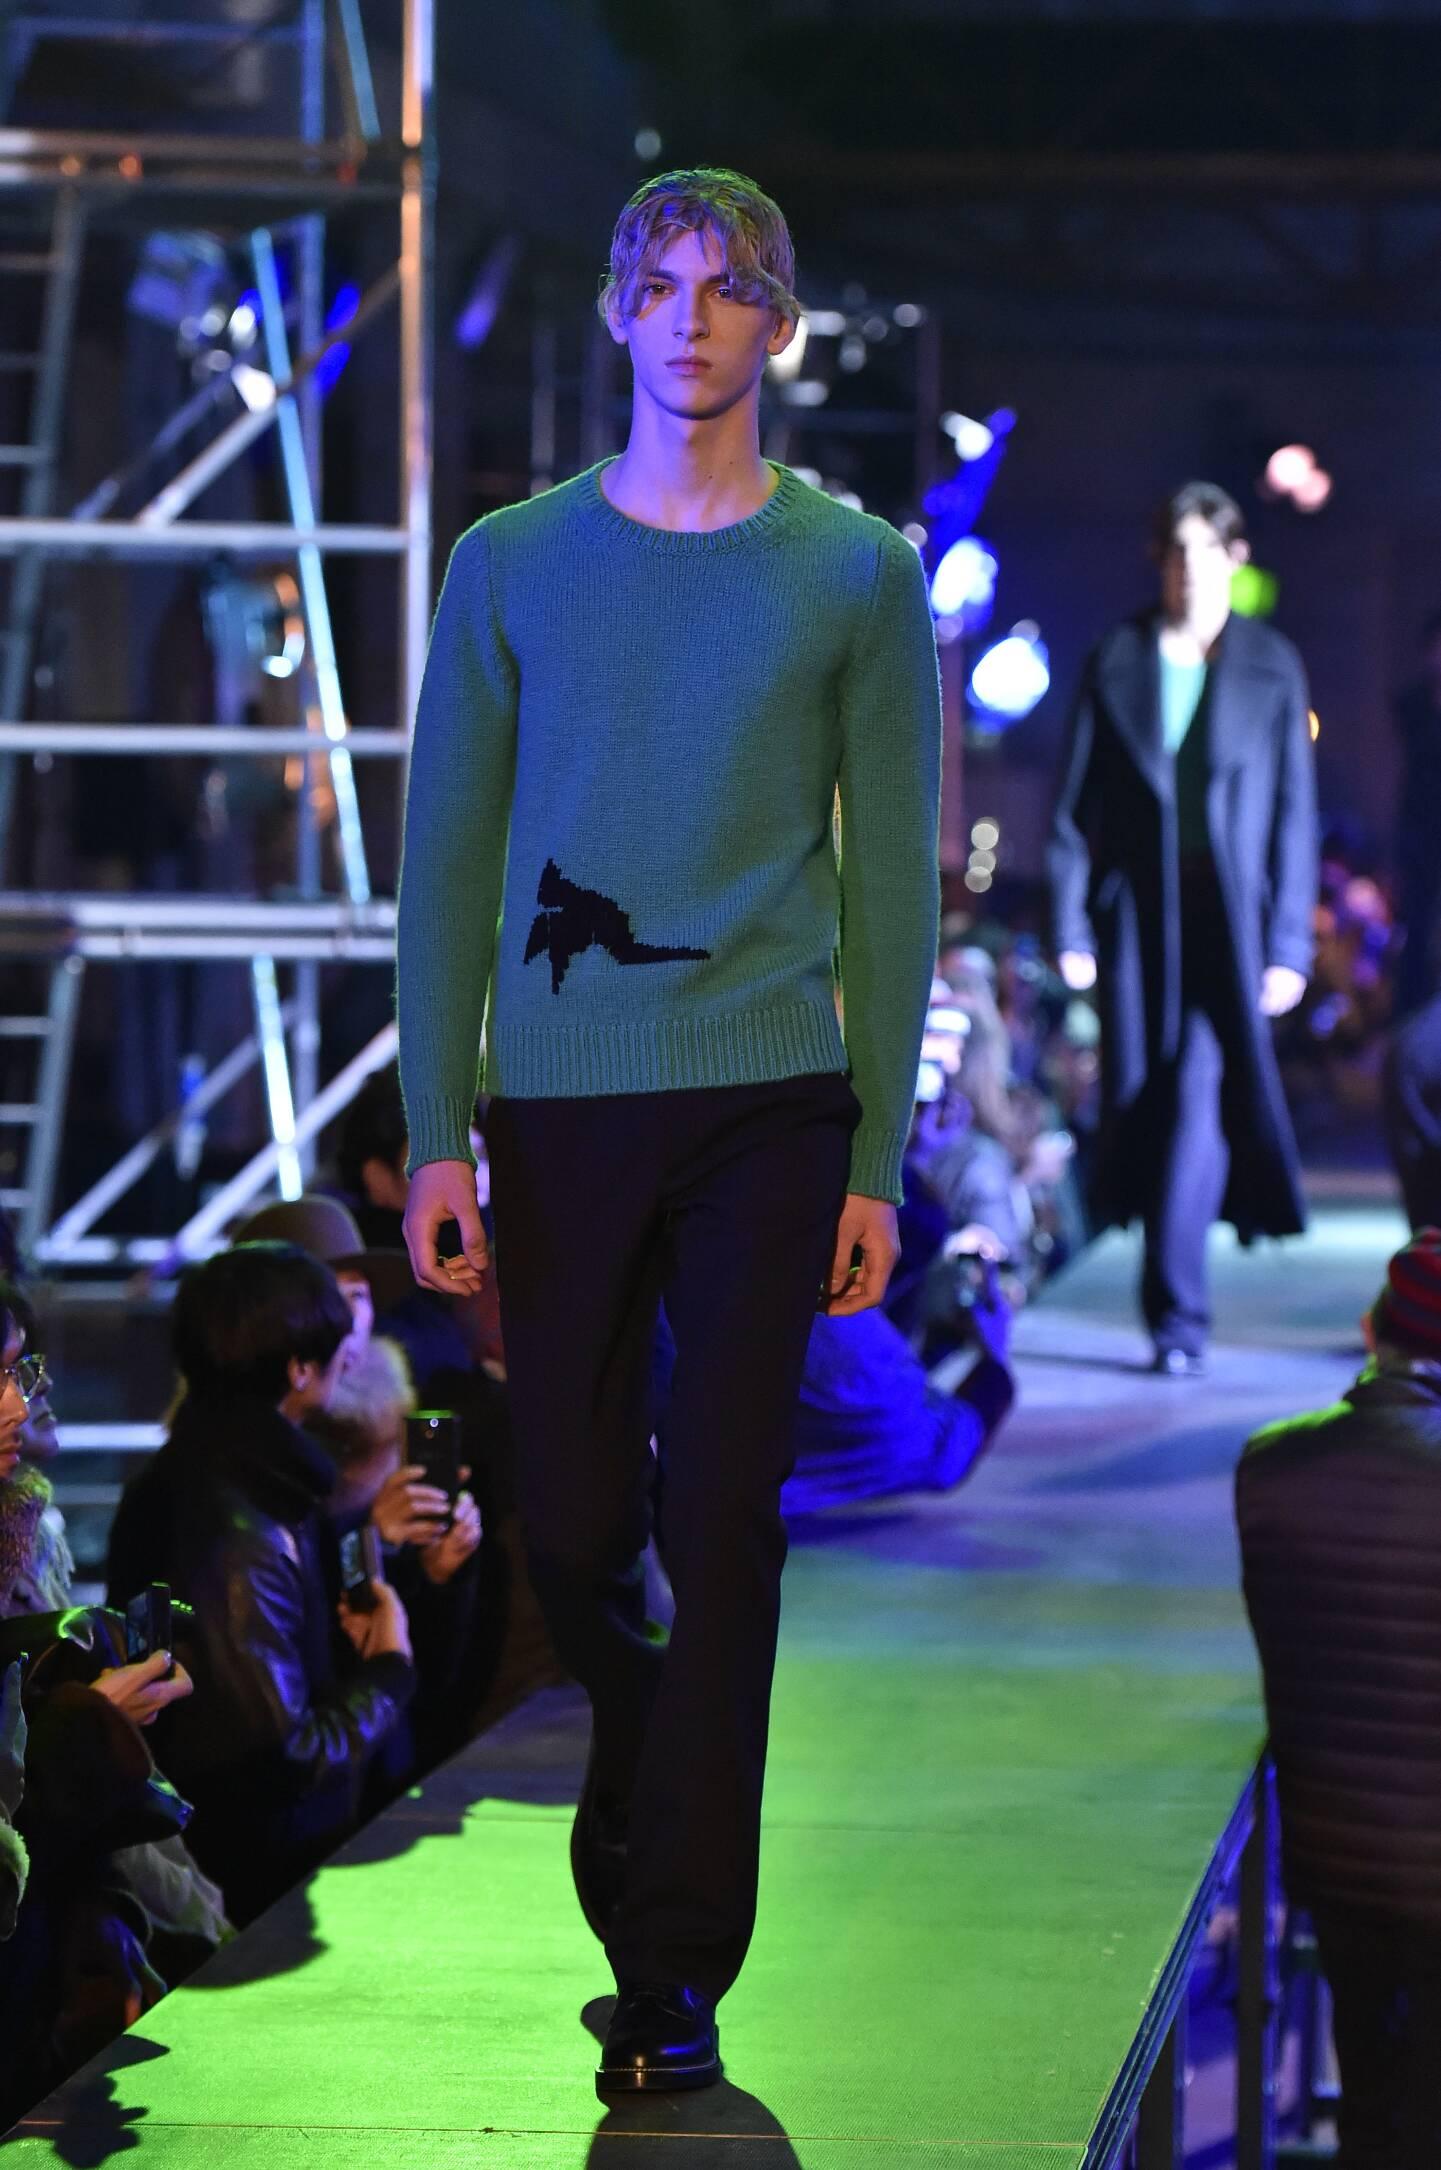 Raf Simons Fall Winter 2015 16 Men's Collection Paris Fashion Week Fashion Show